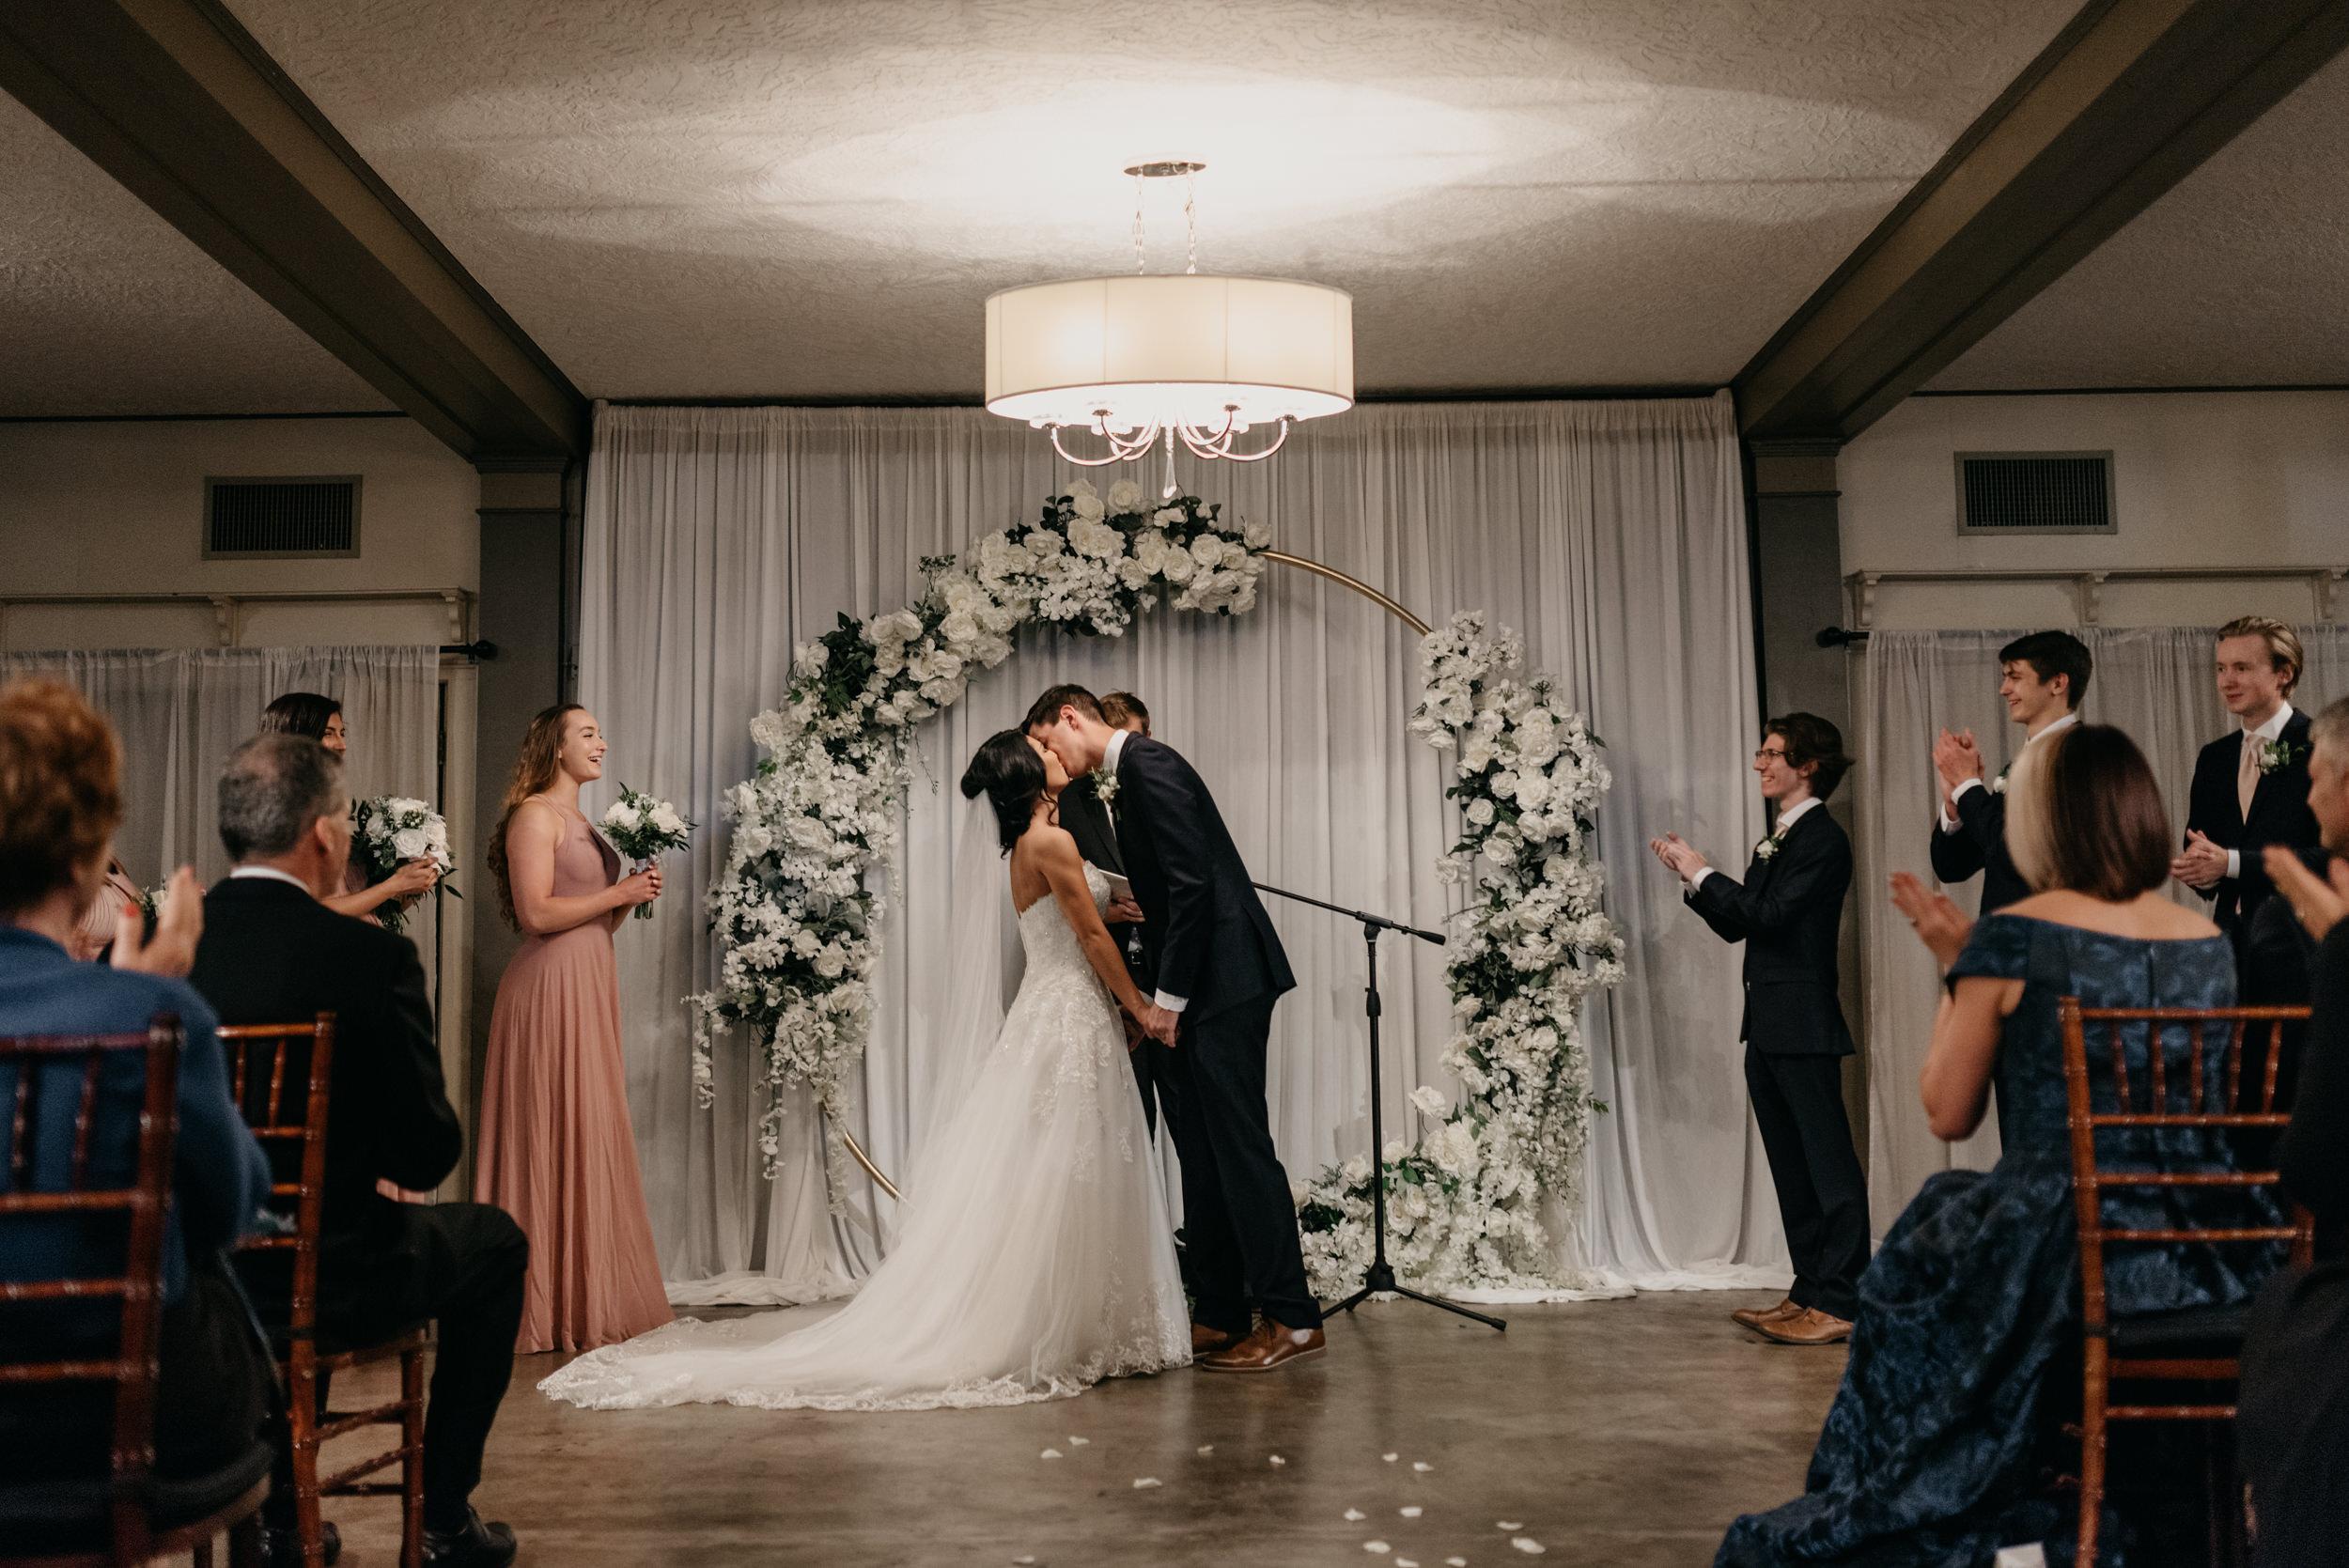 96-ceremony-west-end-ballroom-portland-wedding-venue-8028.jpg